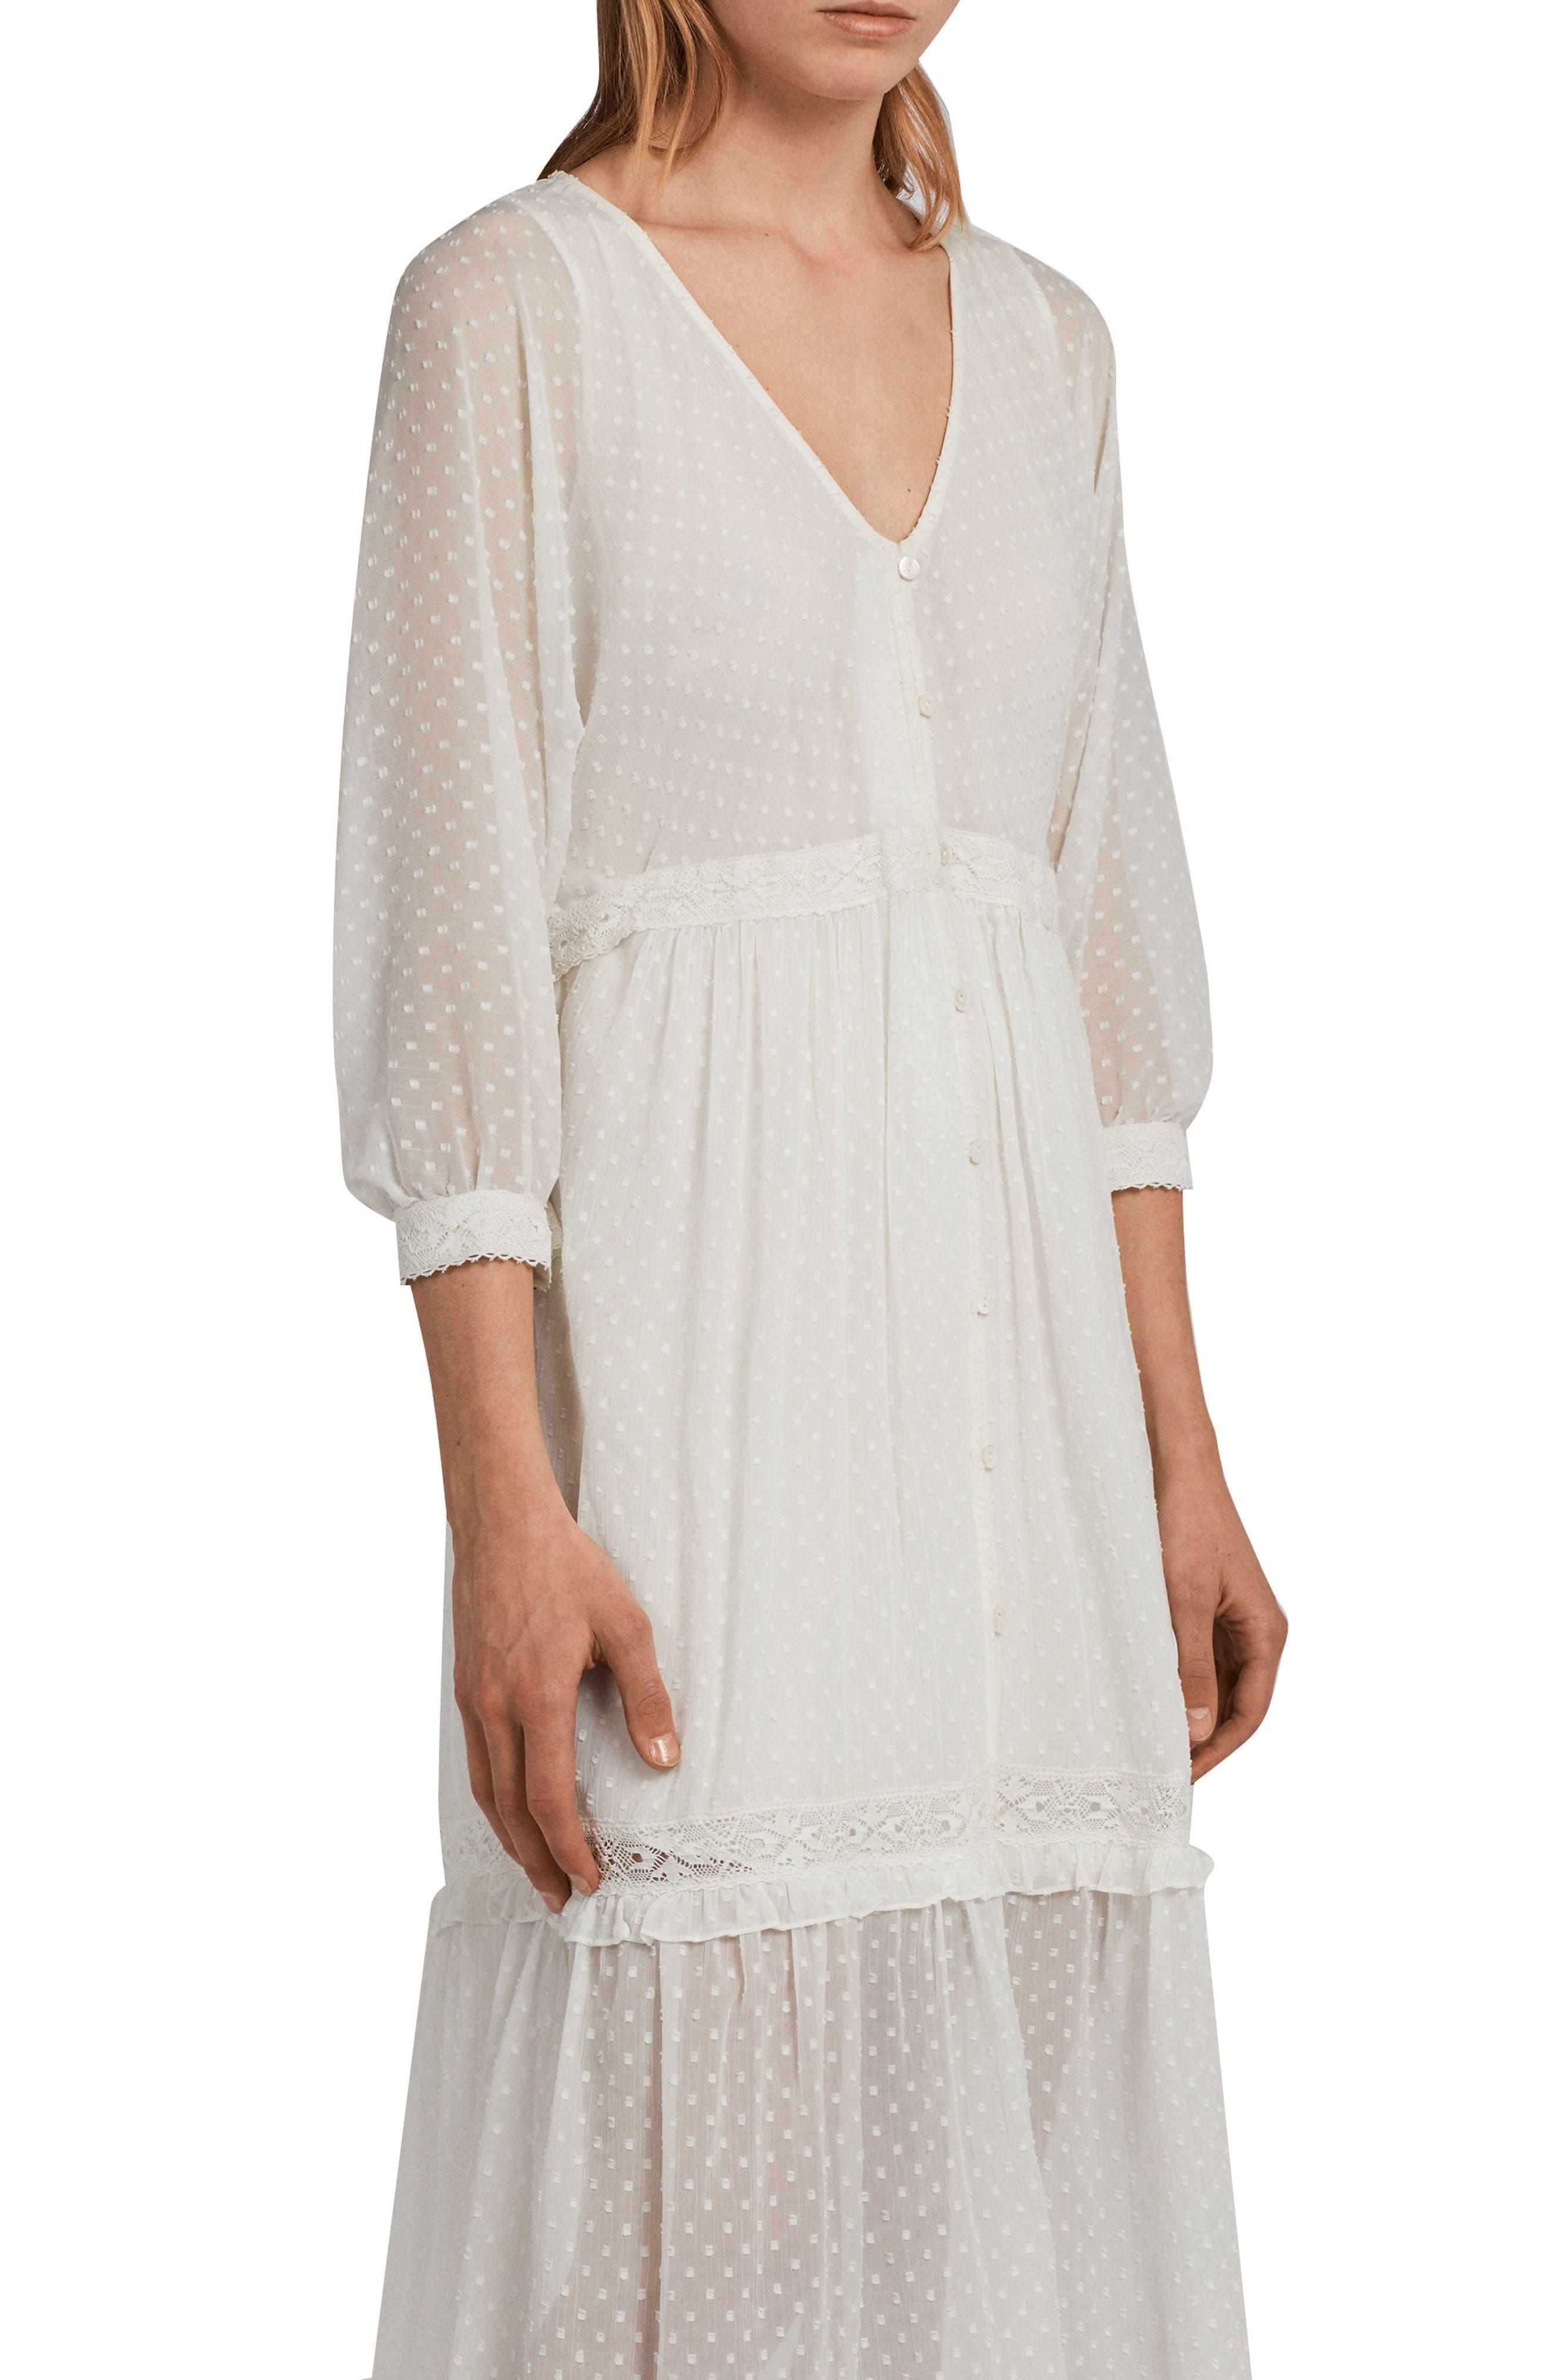 Palma Polka Dot Dress,                             Alternate thumbnail 4, color,                             Chalk White